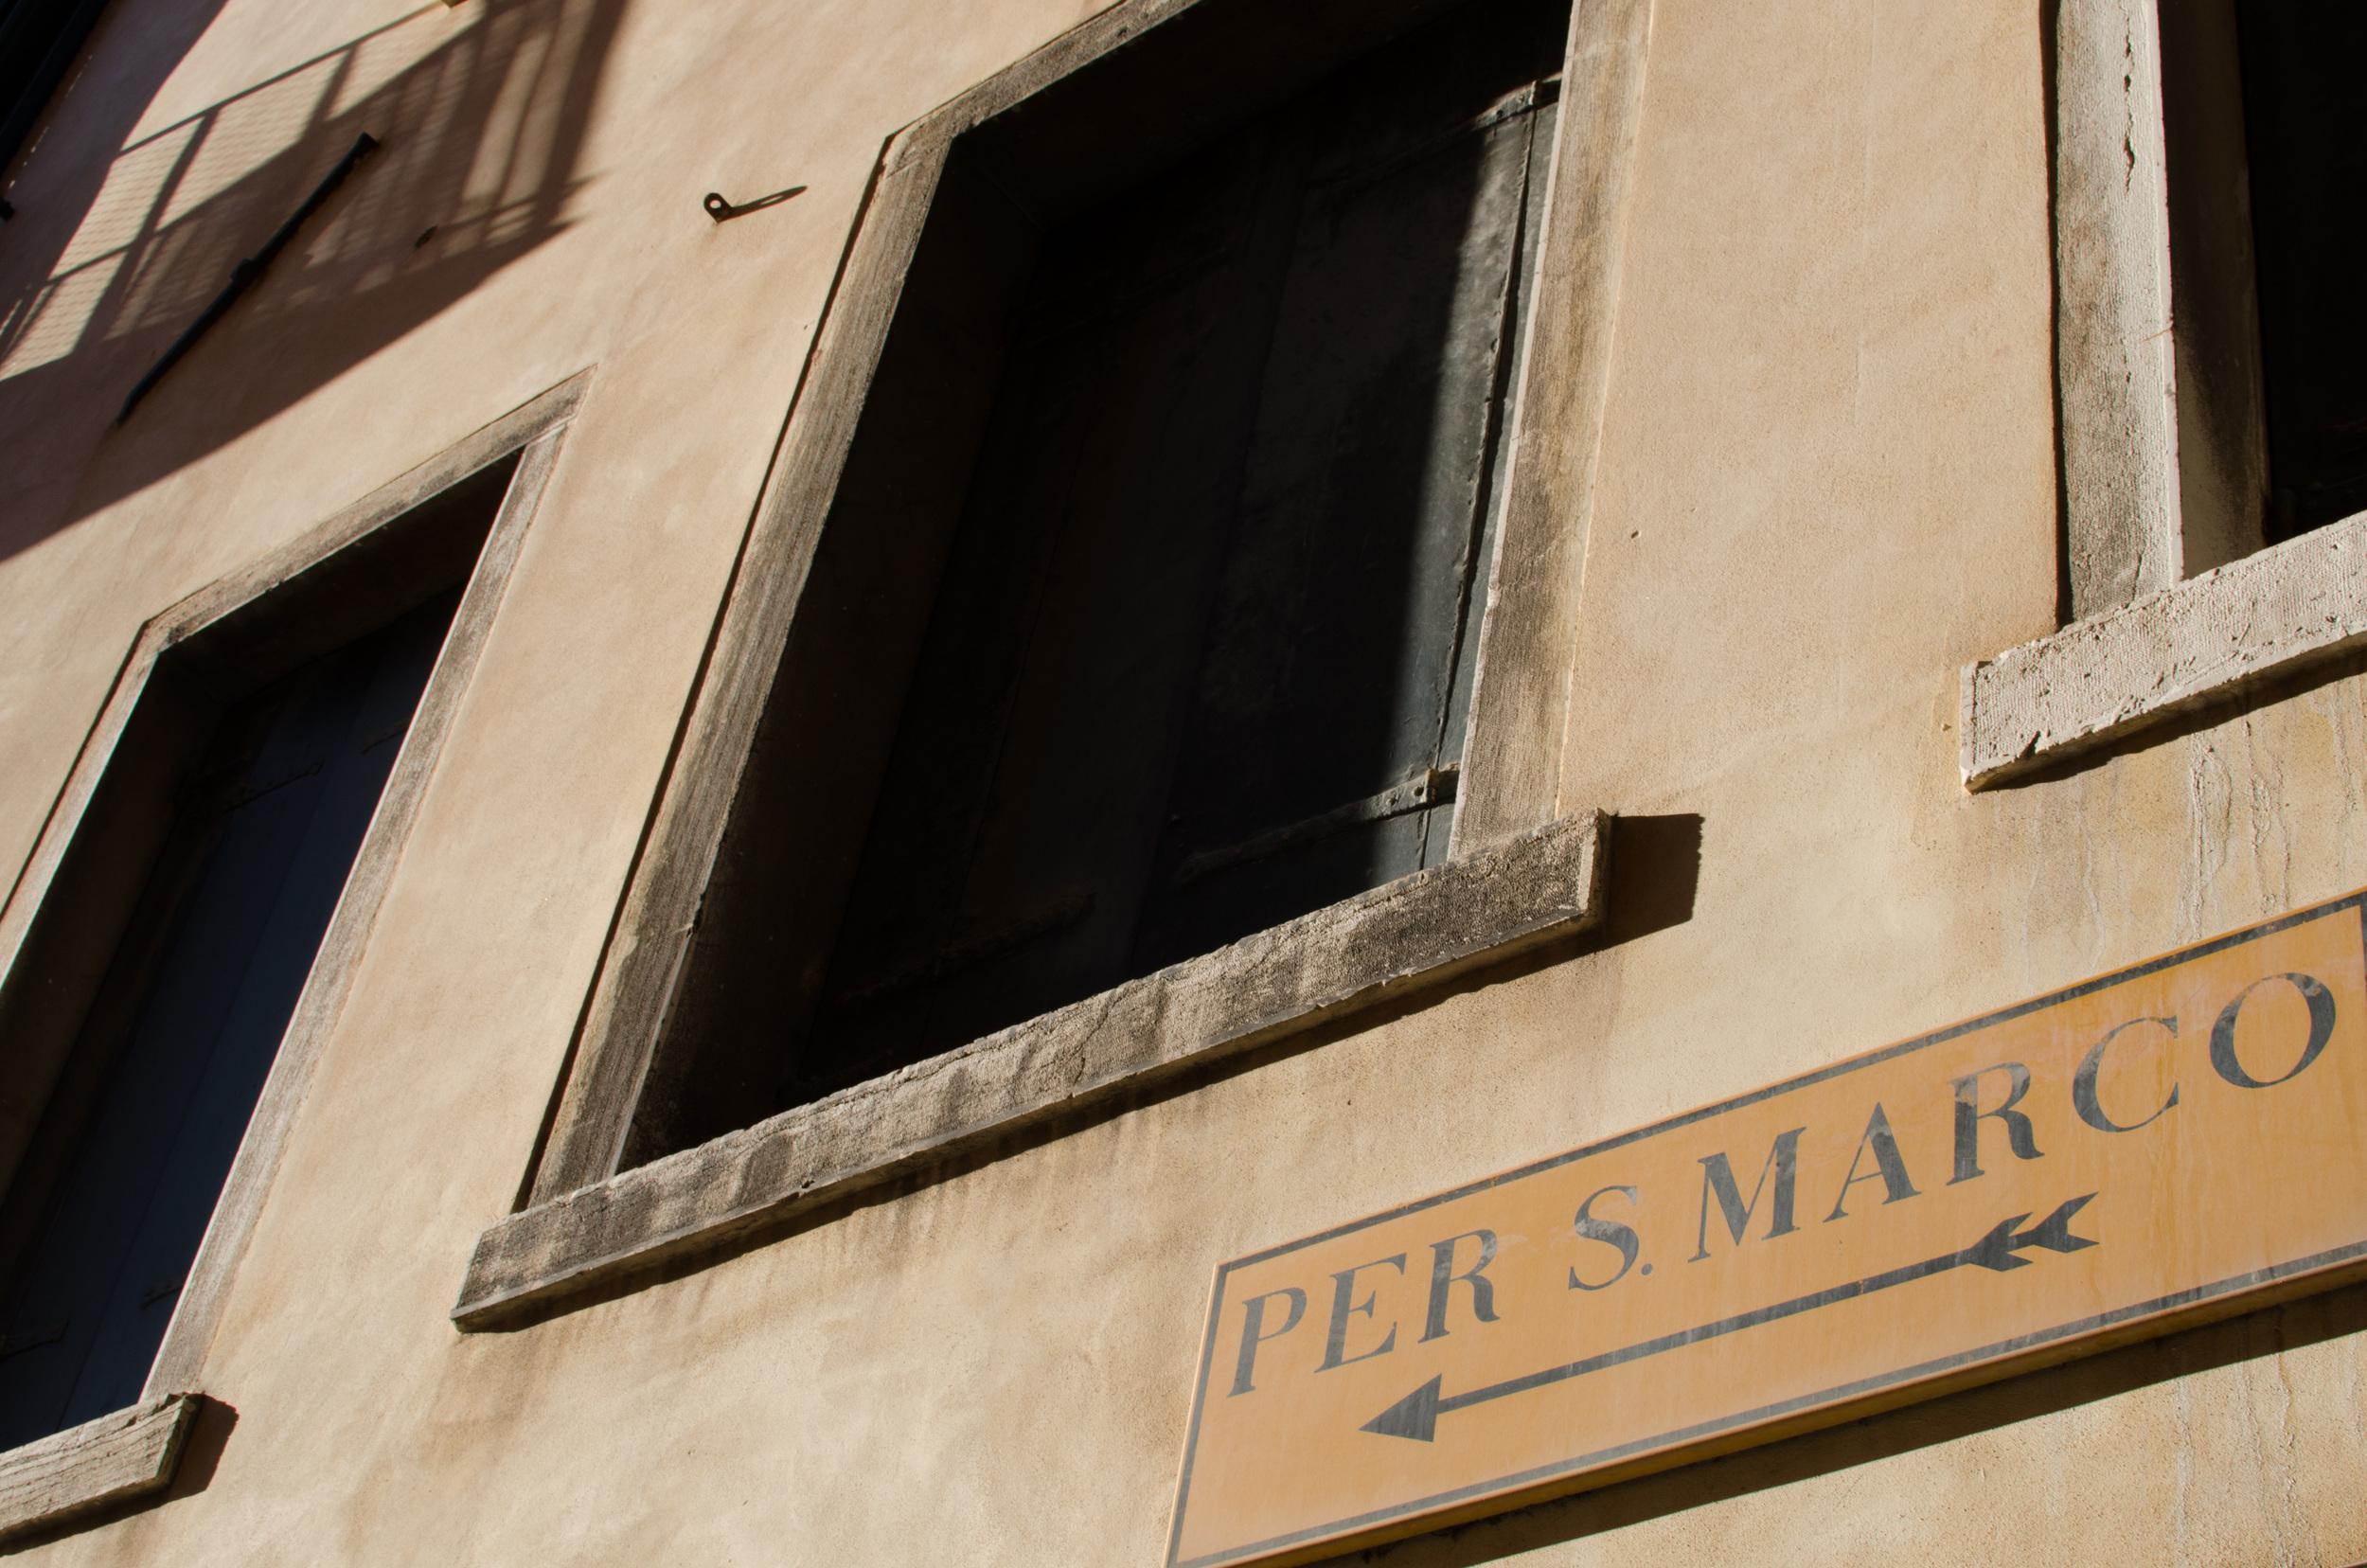 Per San Marco